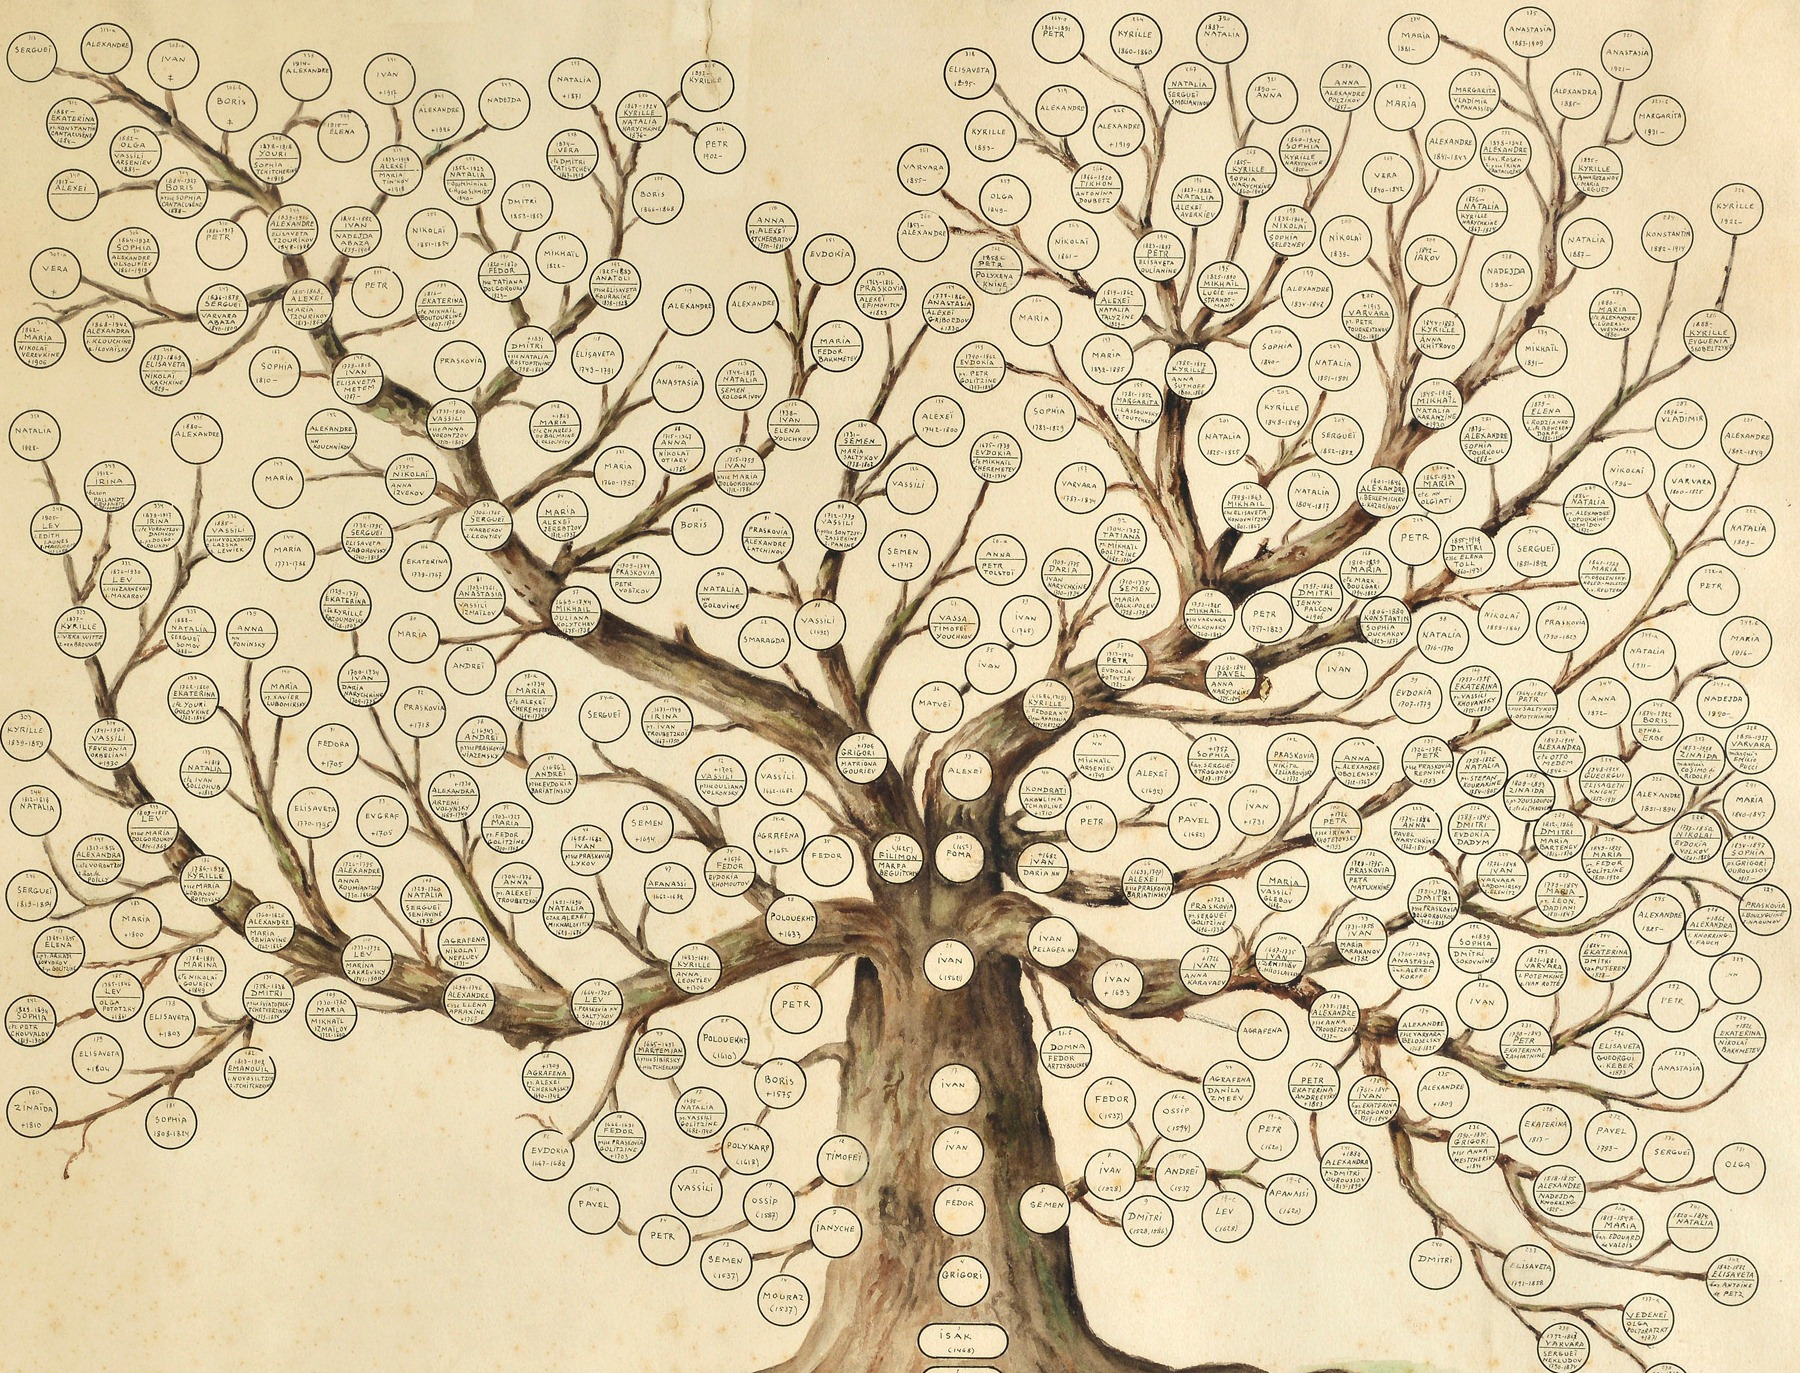 Arbore genealogic model de completat